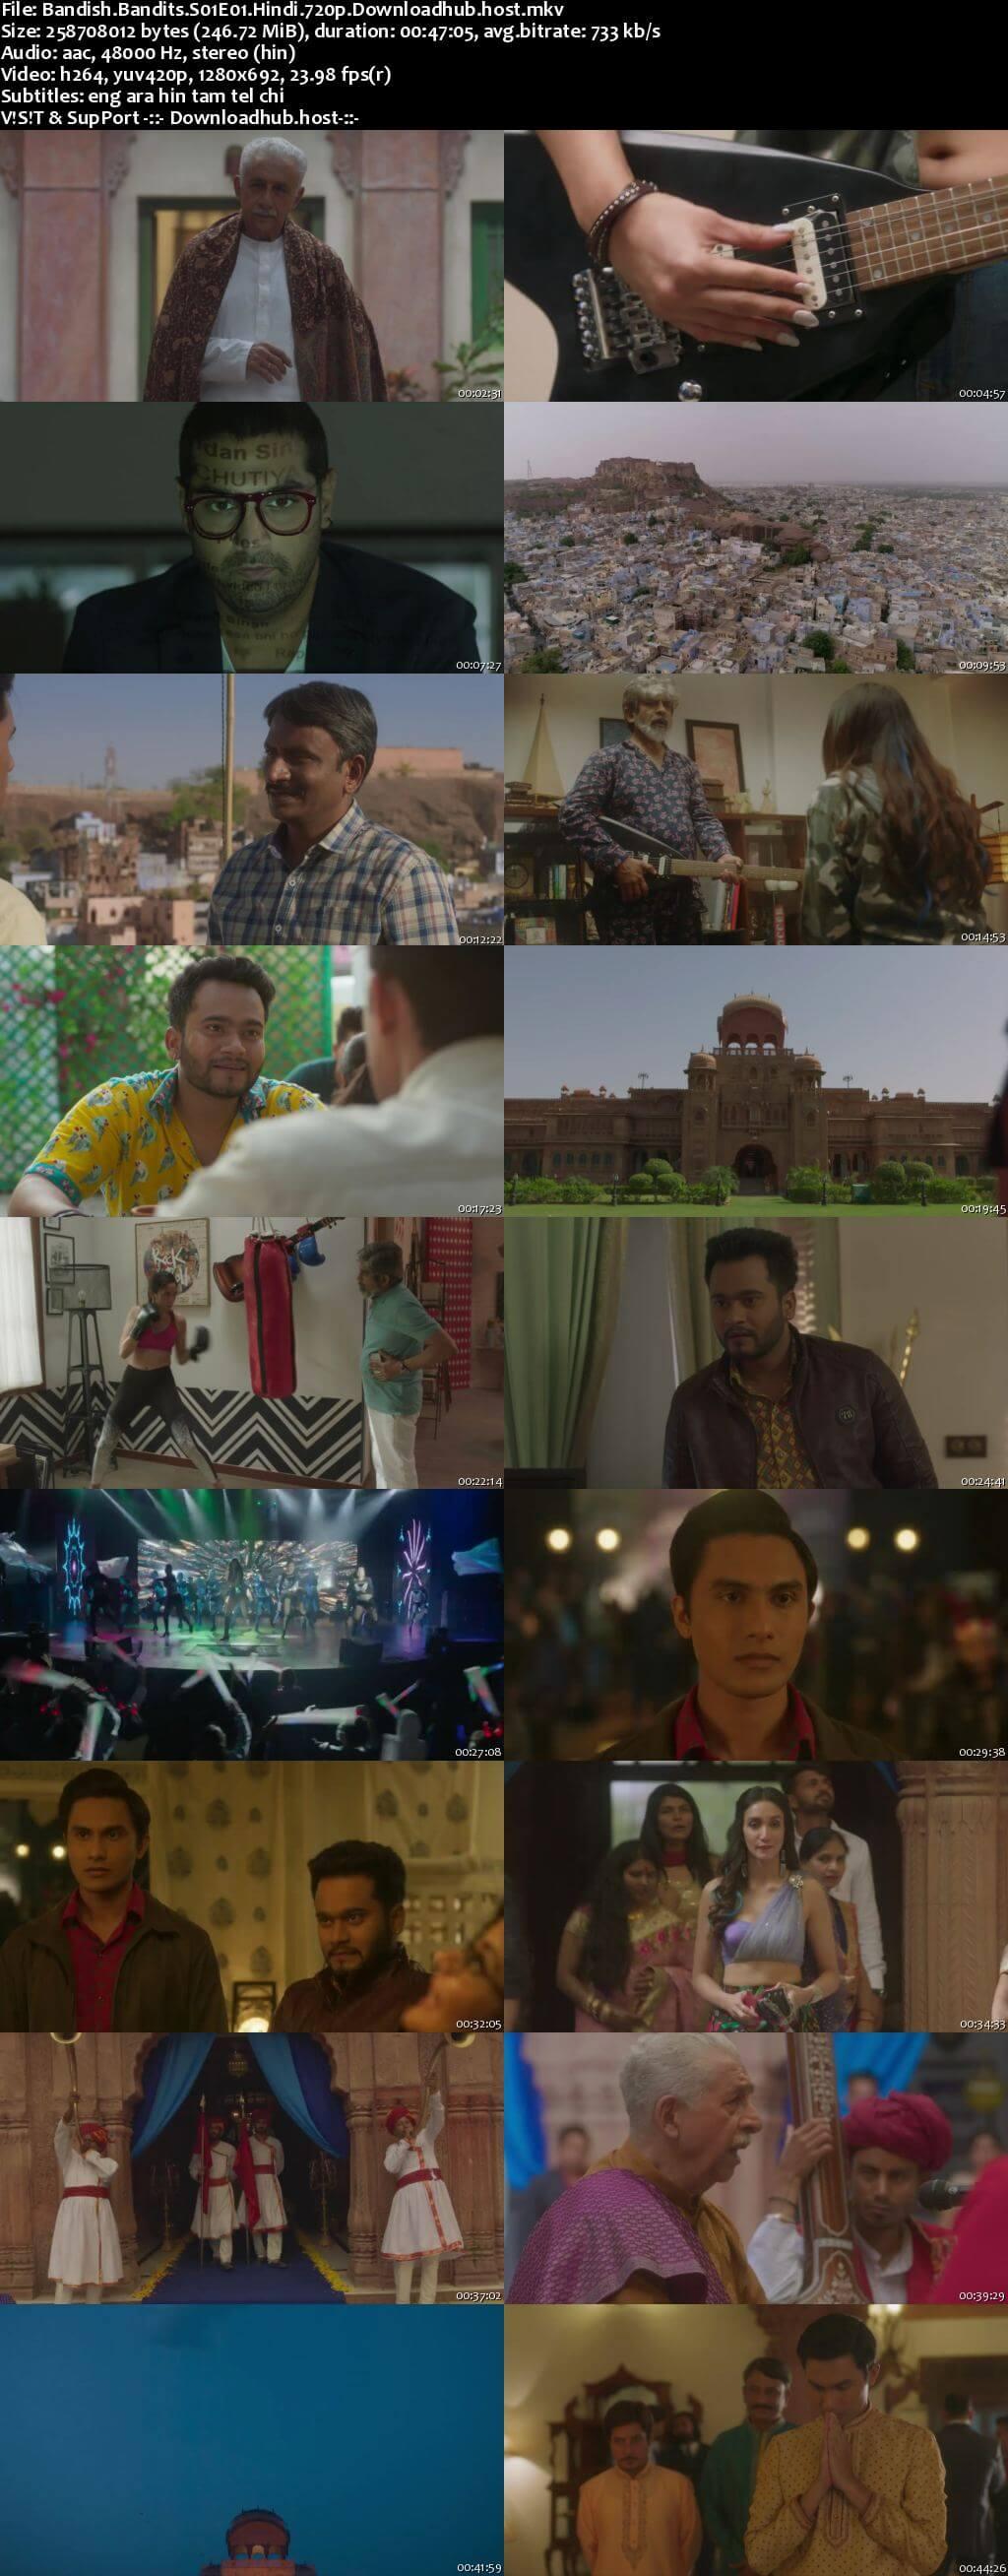 Bandish Bandits 2020 Hindi Season 01 Complete 720p HDRip MSubs